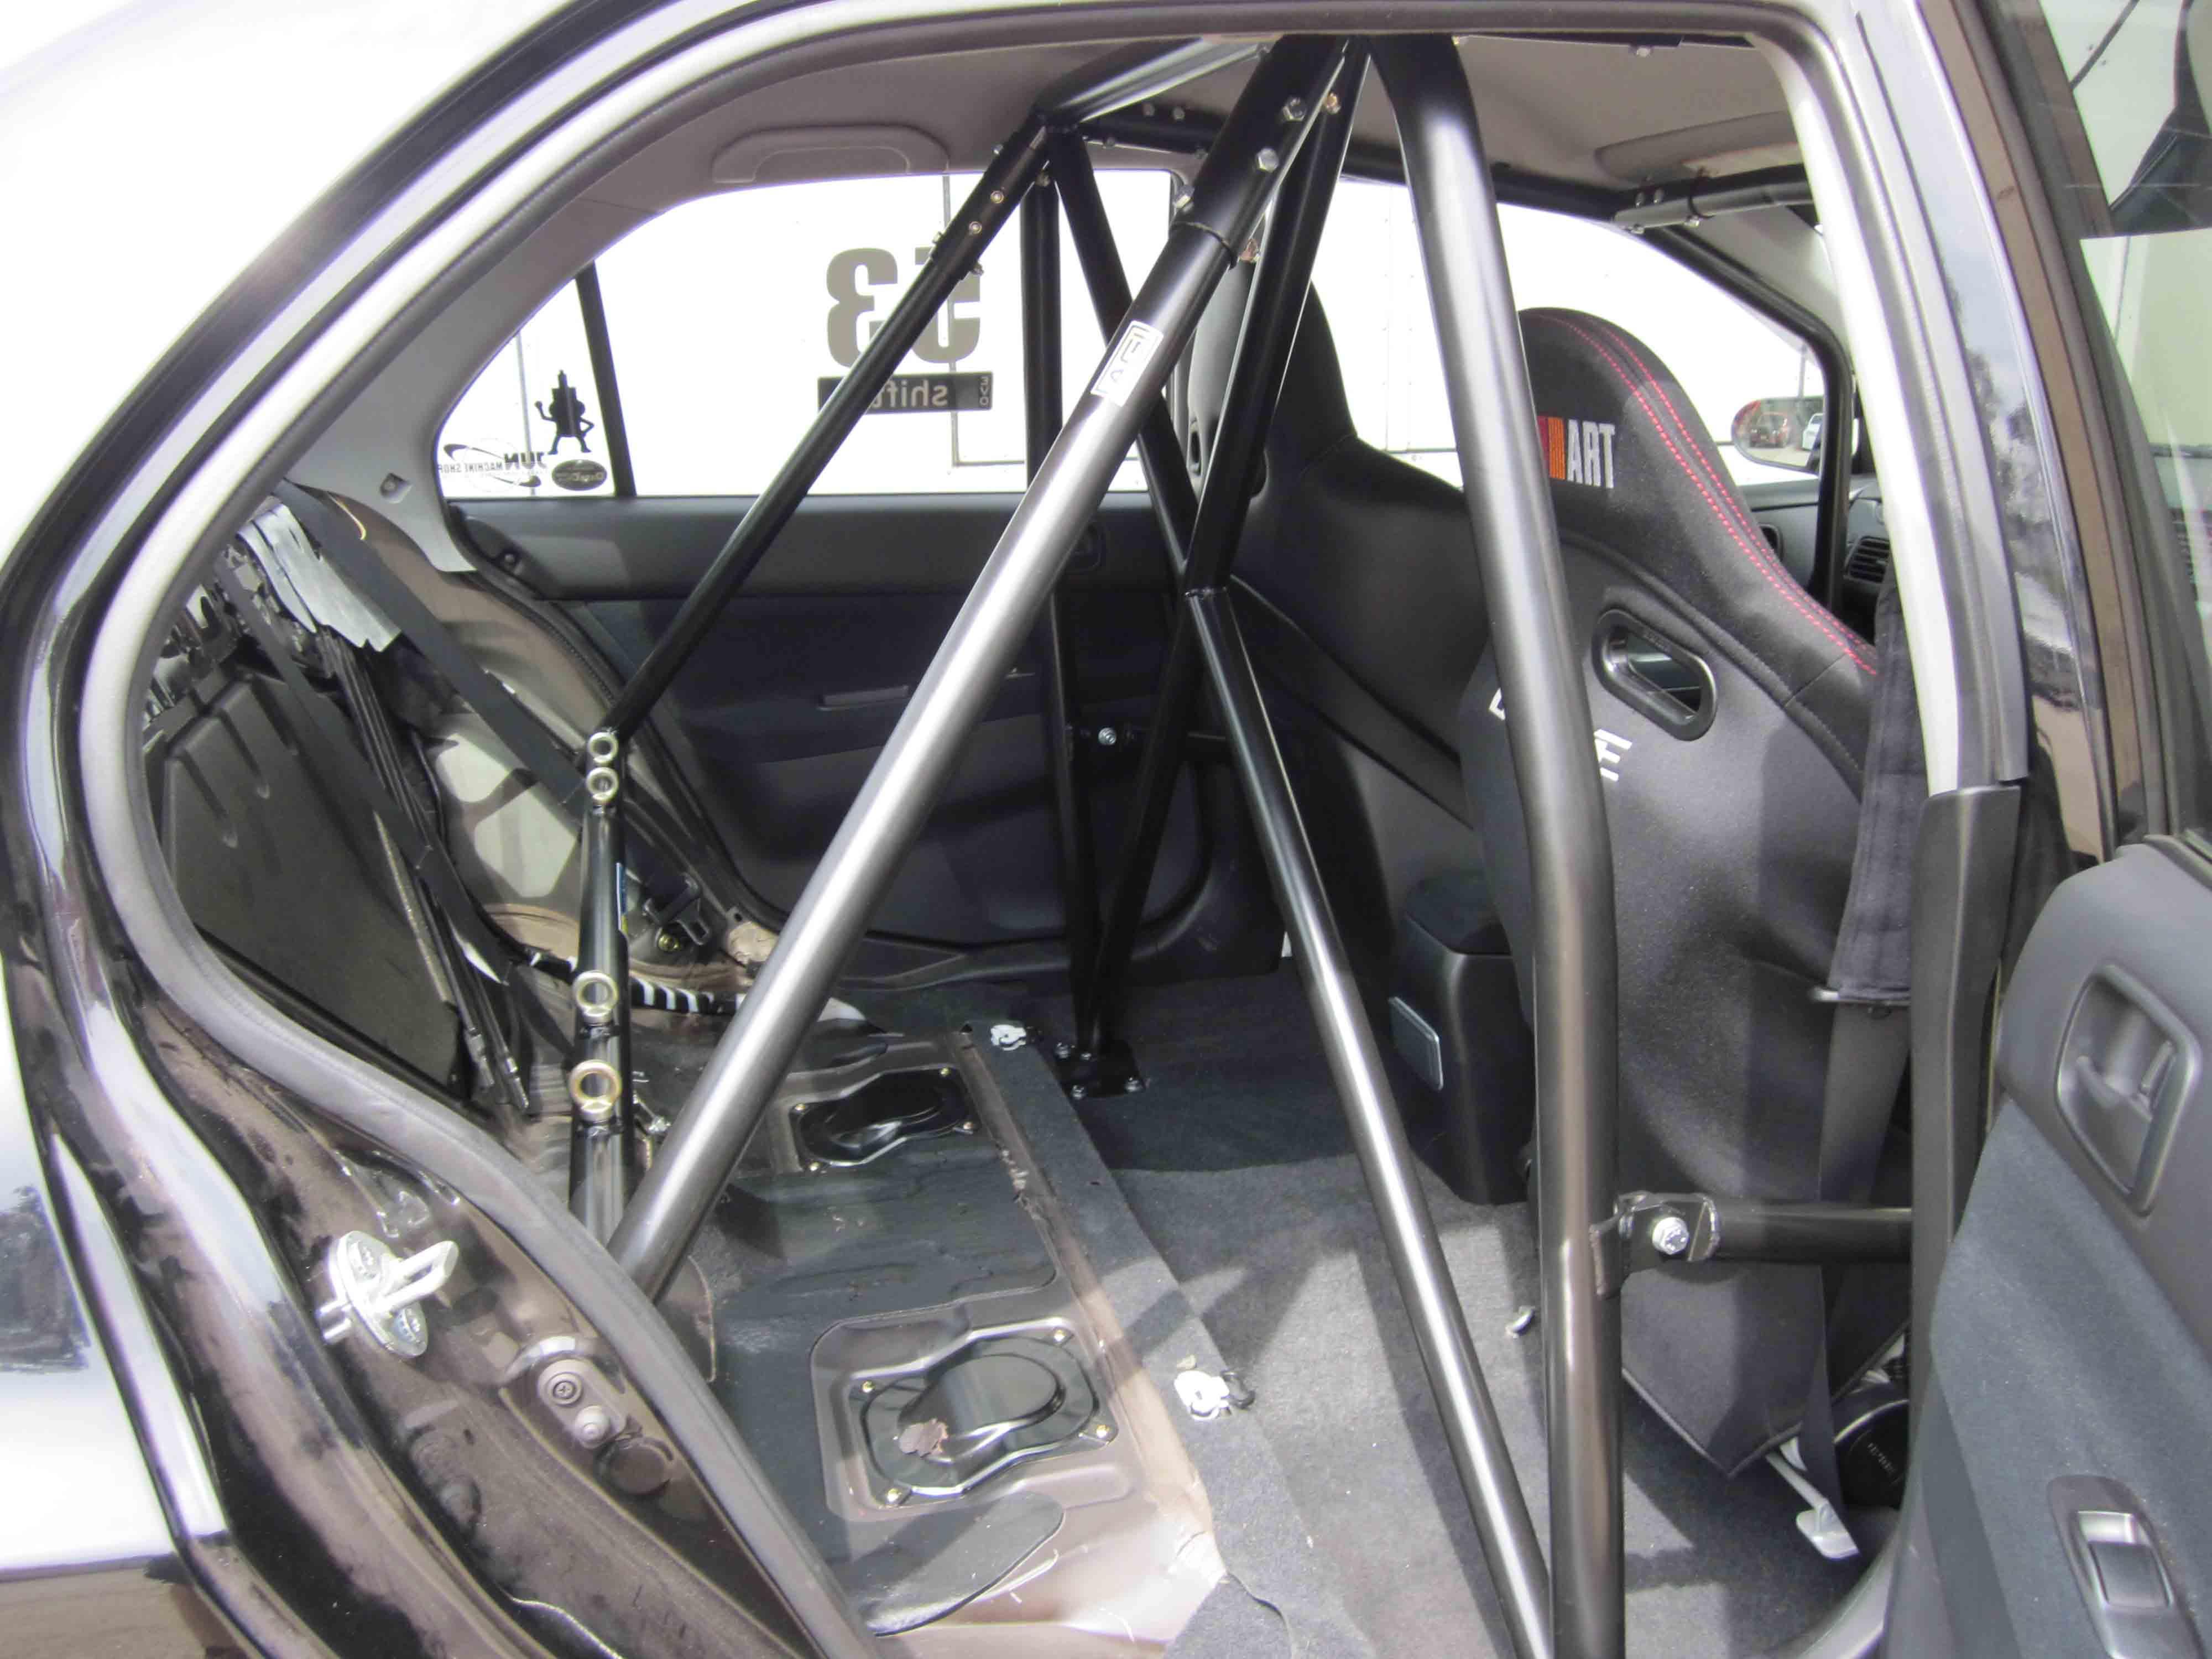 C Mitsubishi Evo 7 9 6pt Full Cage Bolt In Agi